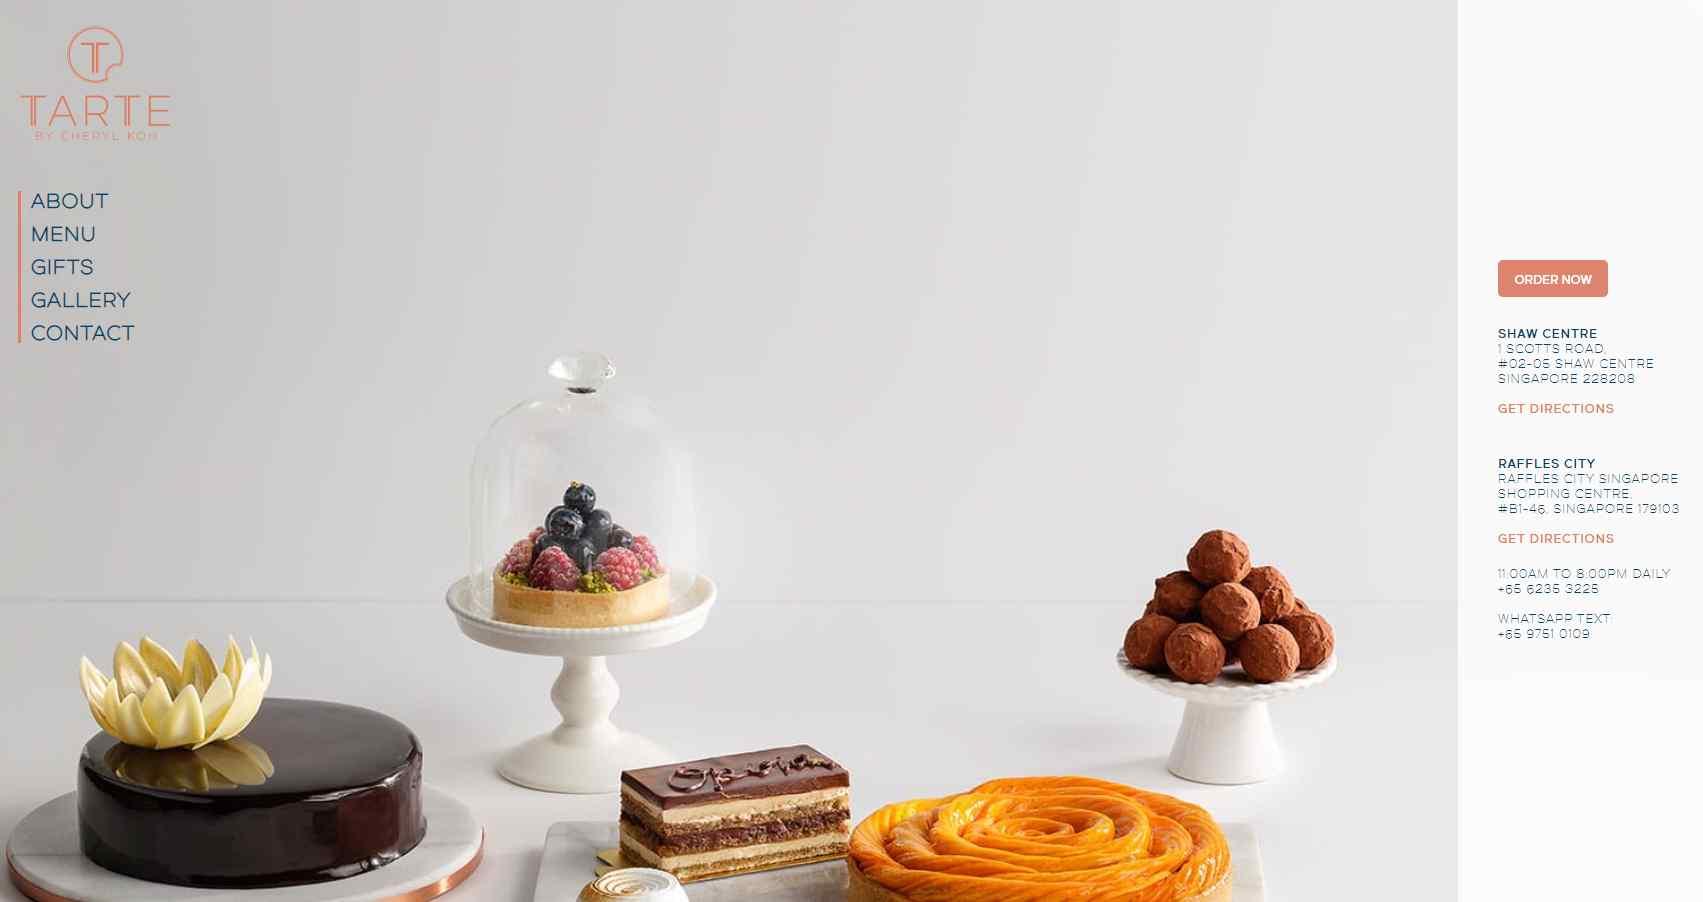 tarte Top Gift Hamper Companies in Singapore